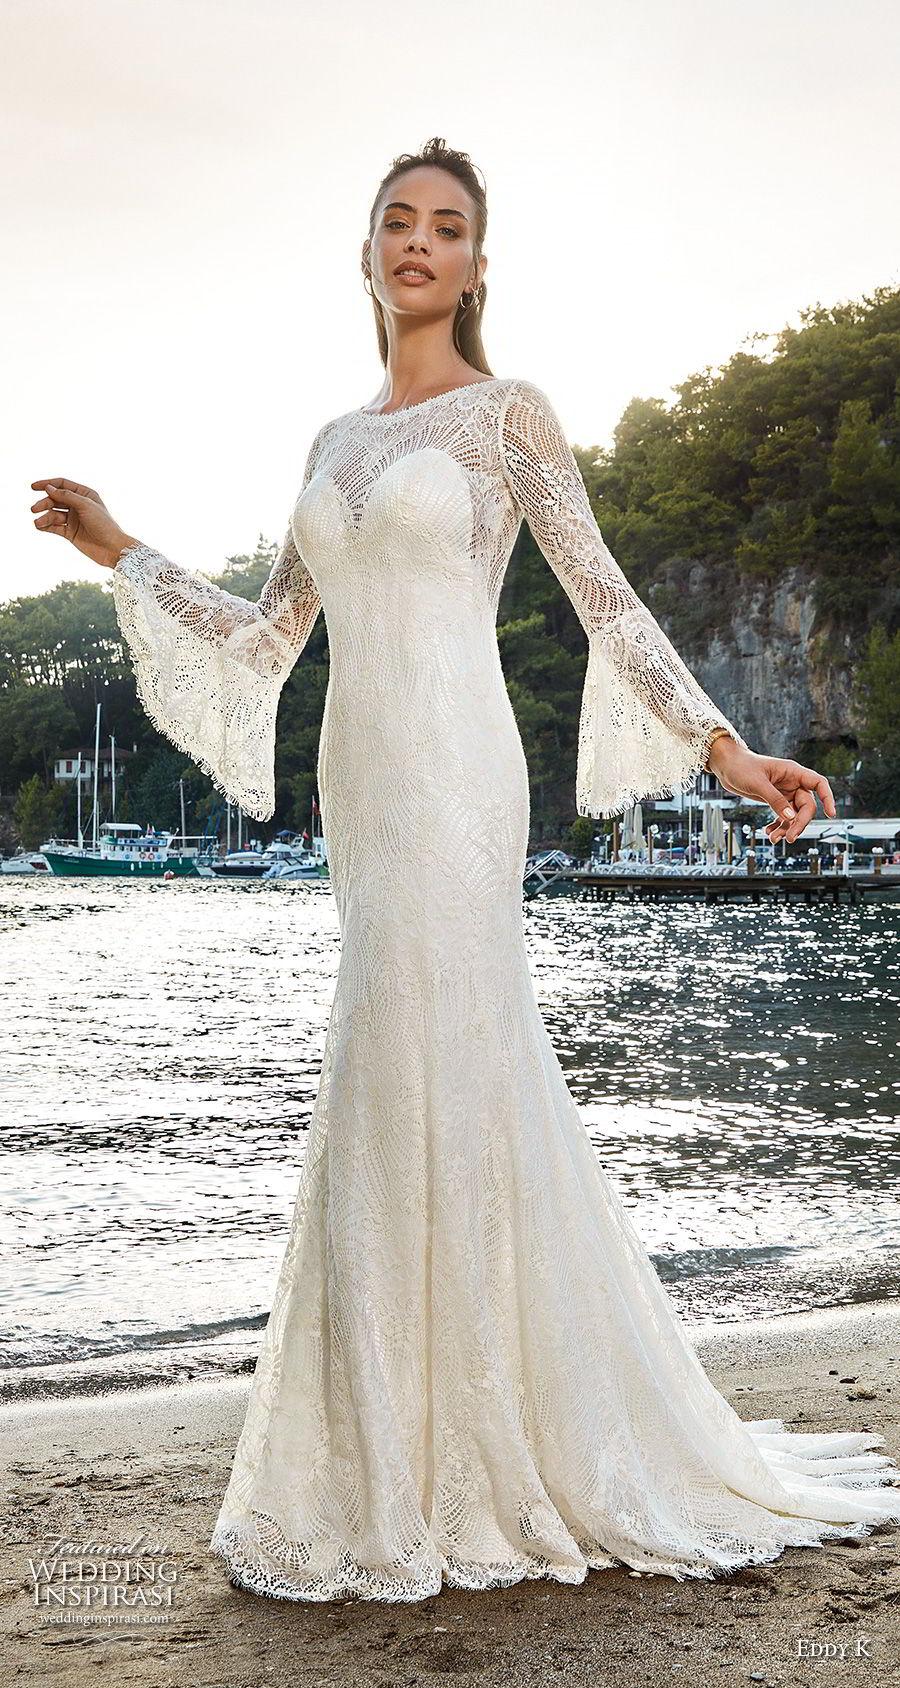 Elegant Boho Women White Wedding Gowns 2019 Wedding Dress Party